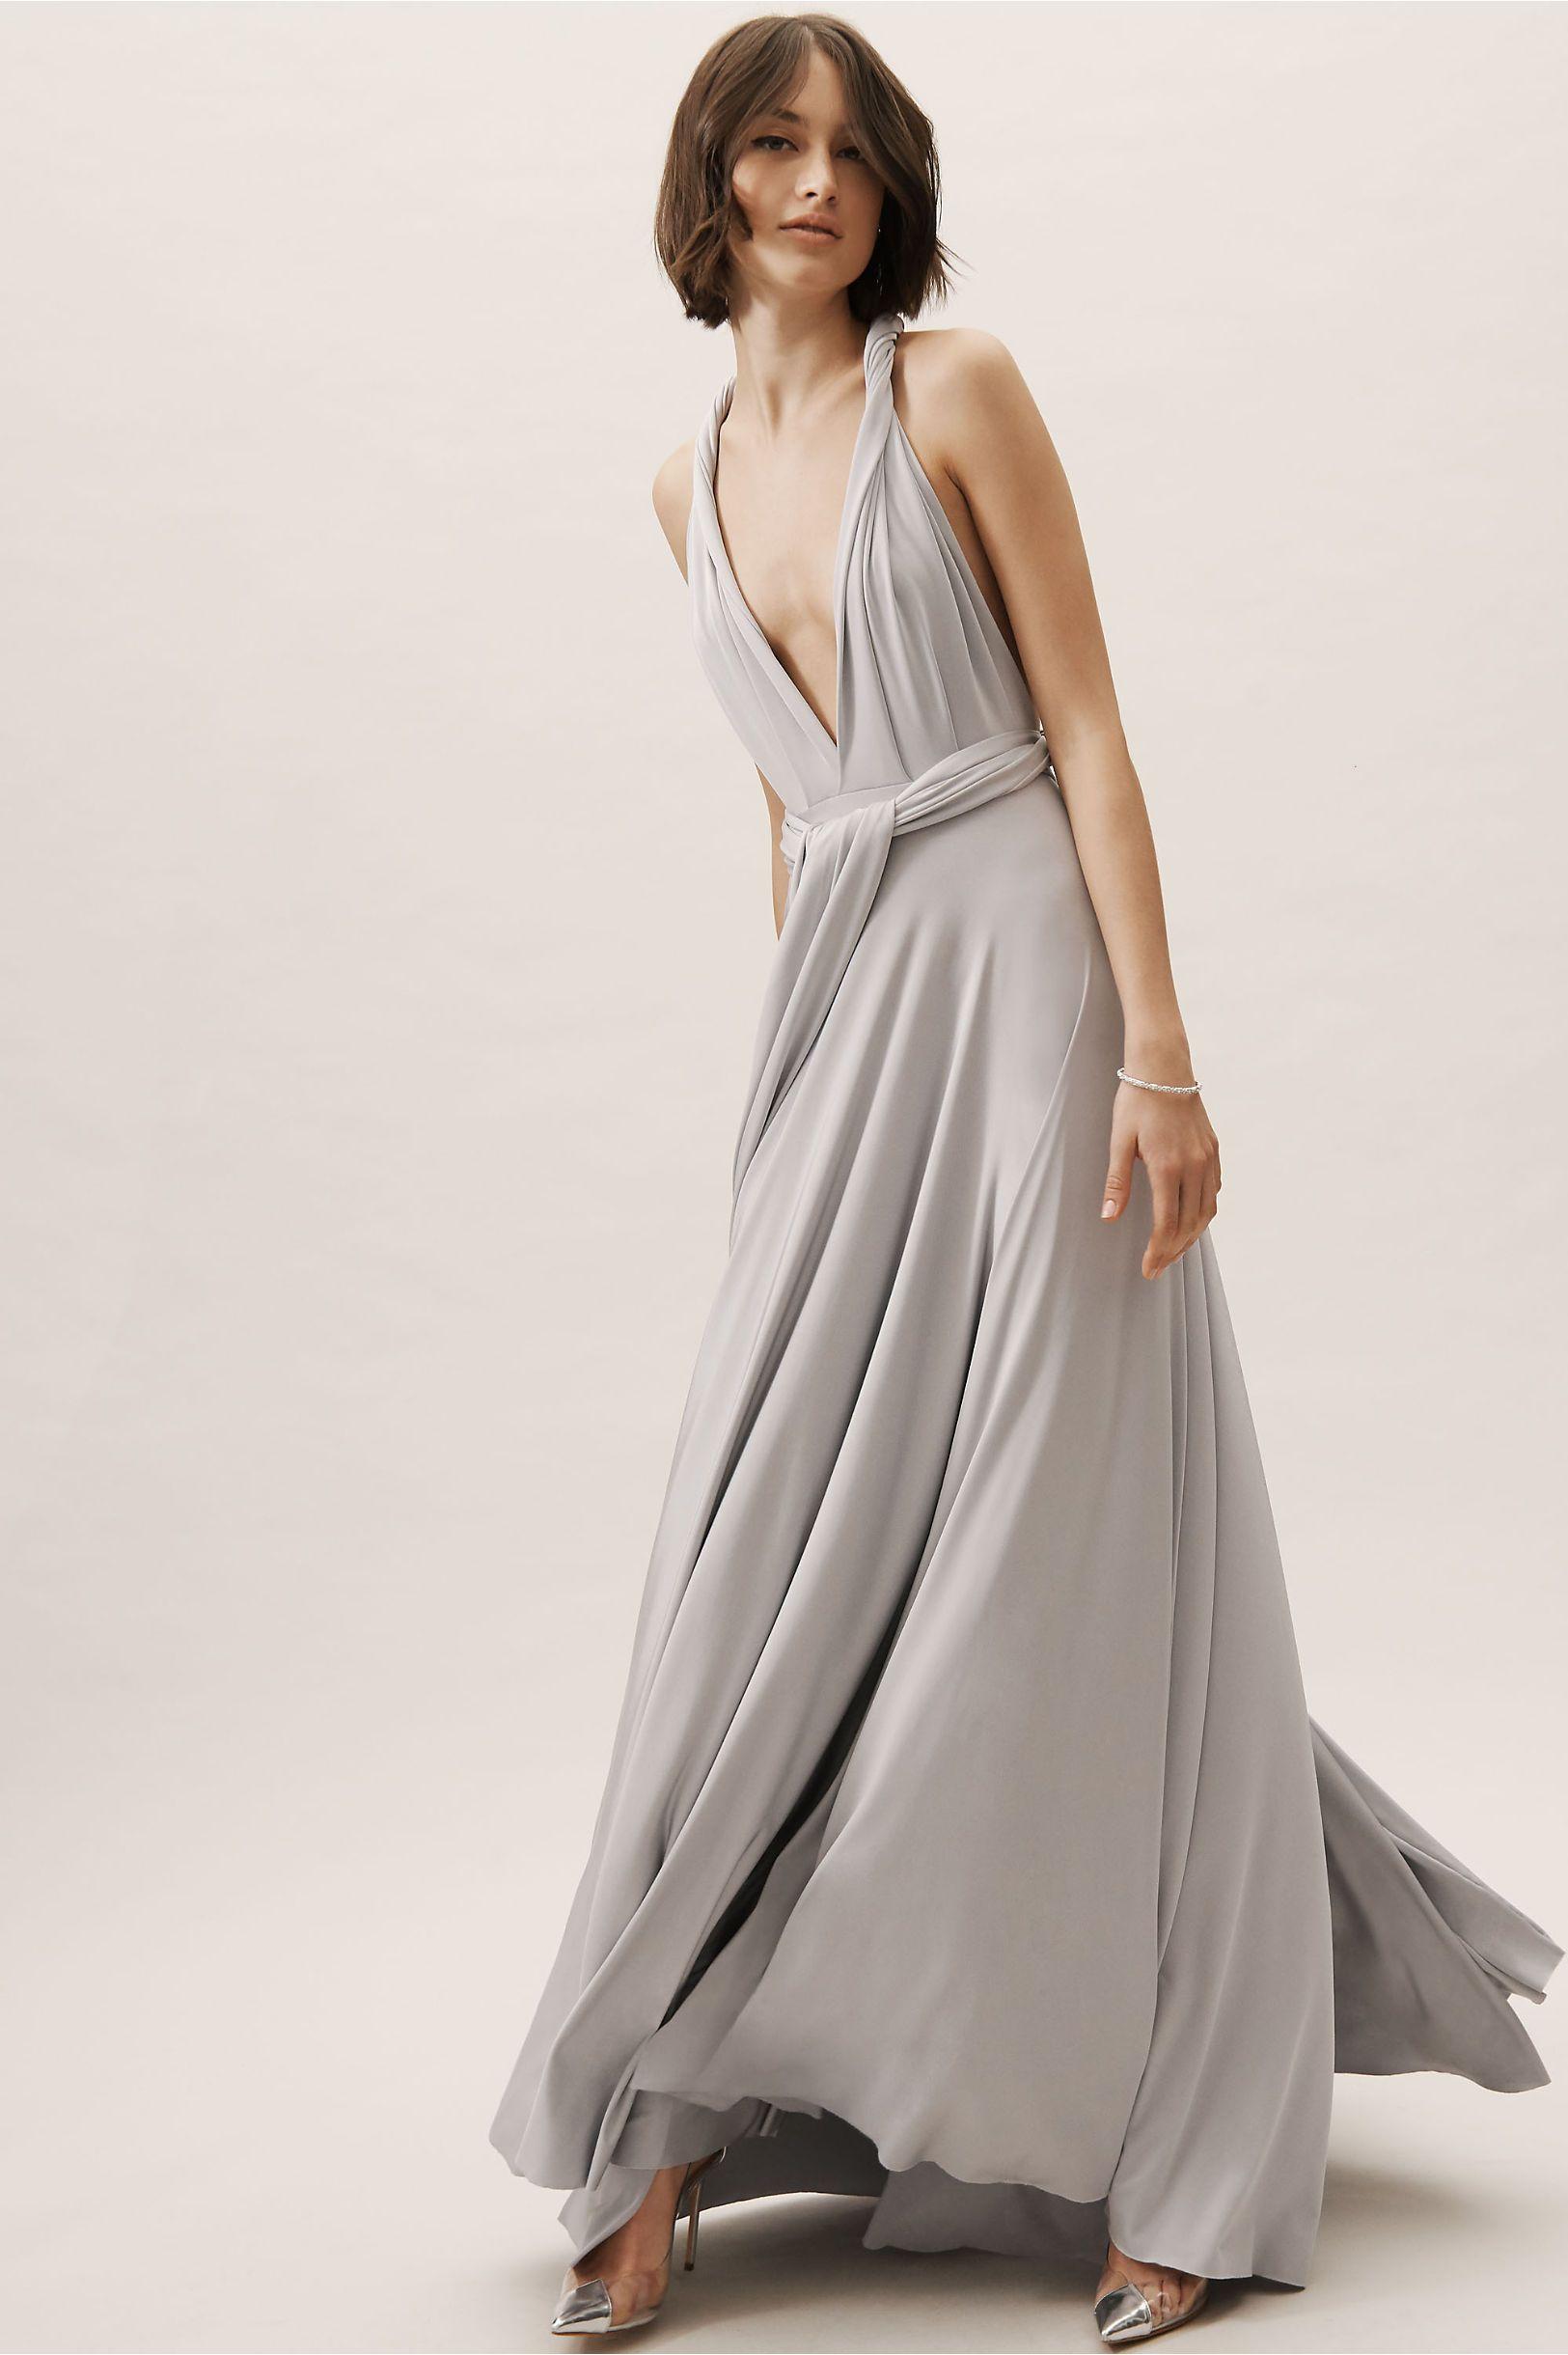 Twobirds Ginger Convertible Maxi Dress Maxi Dress Convertible Maxi Dress Convertible Maxi